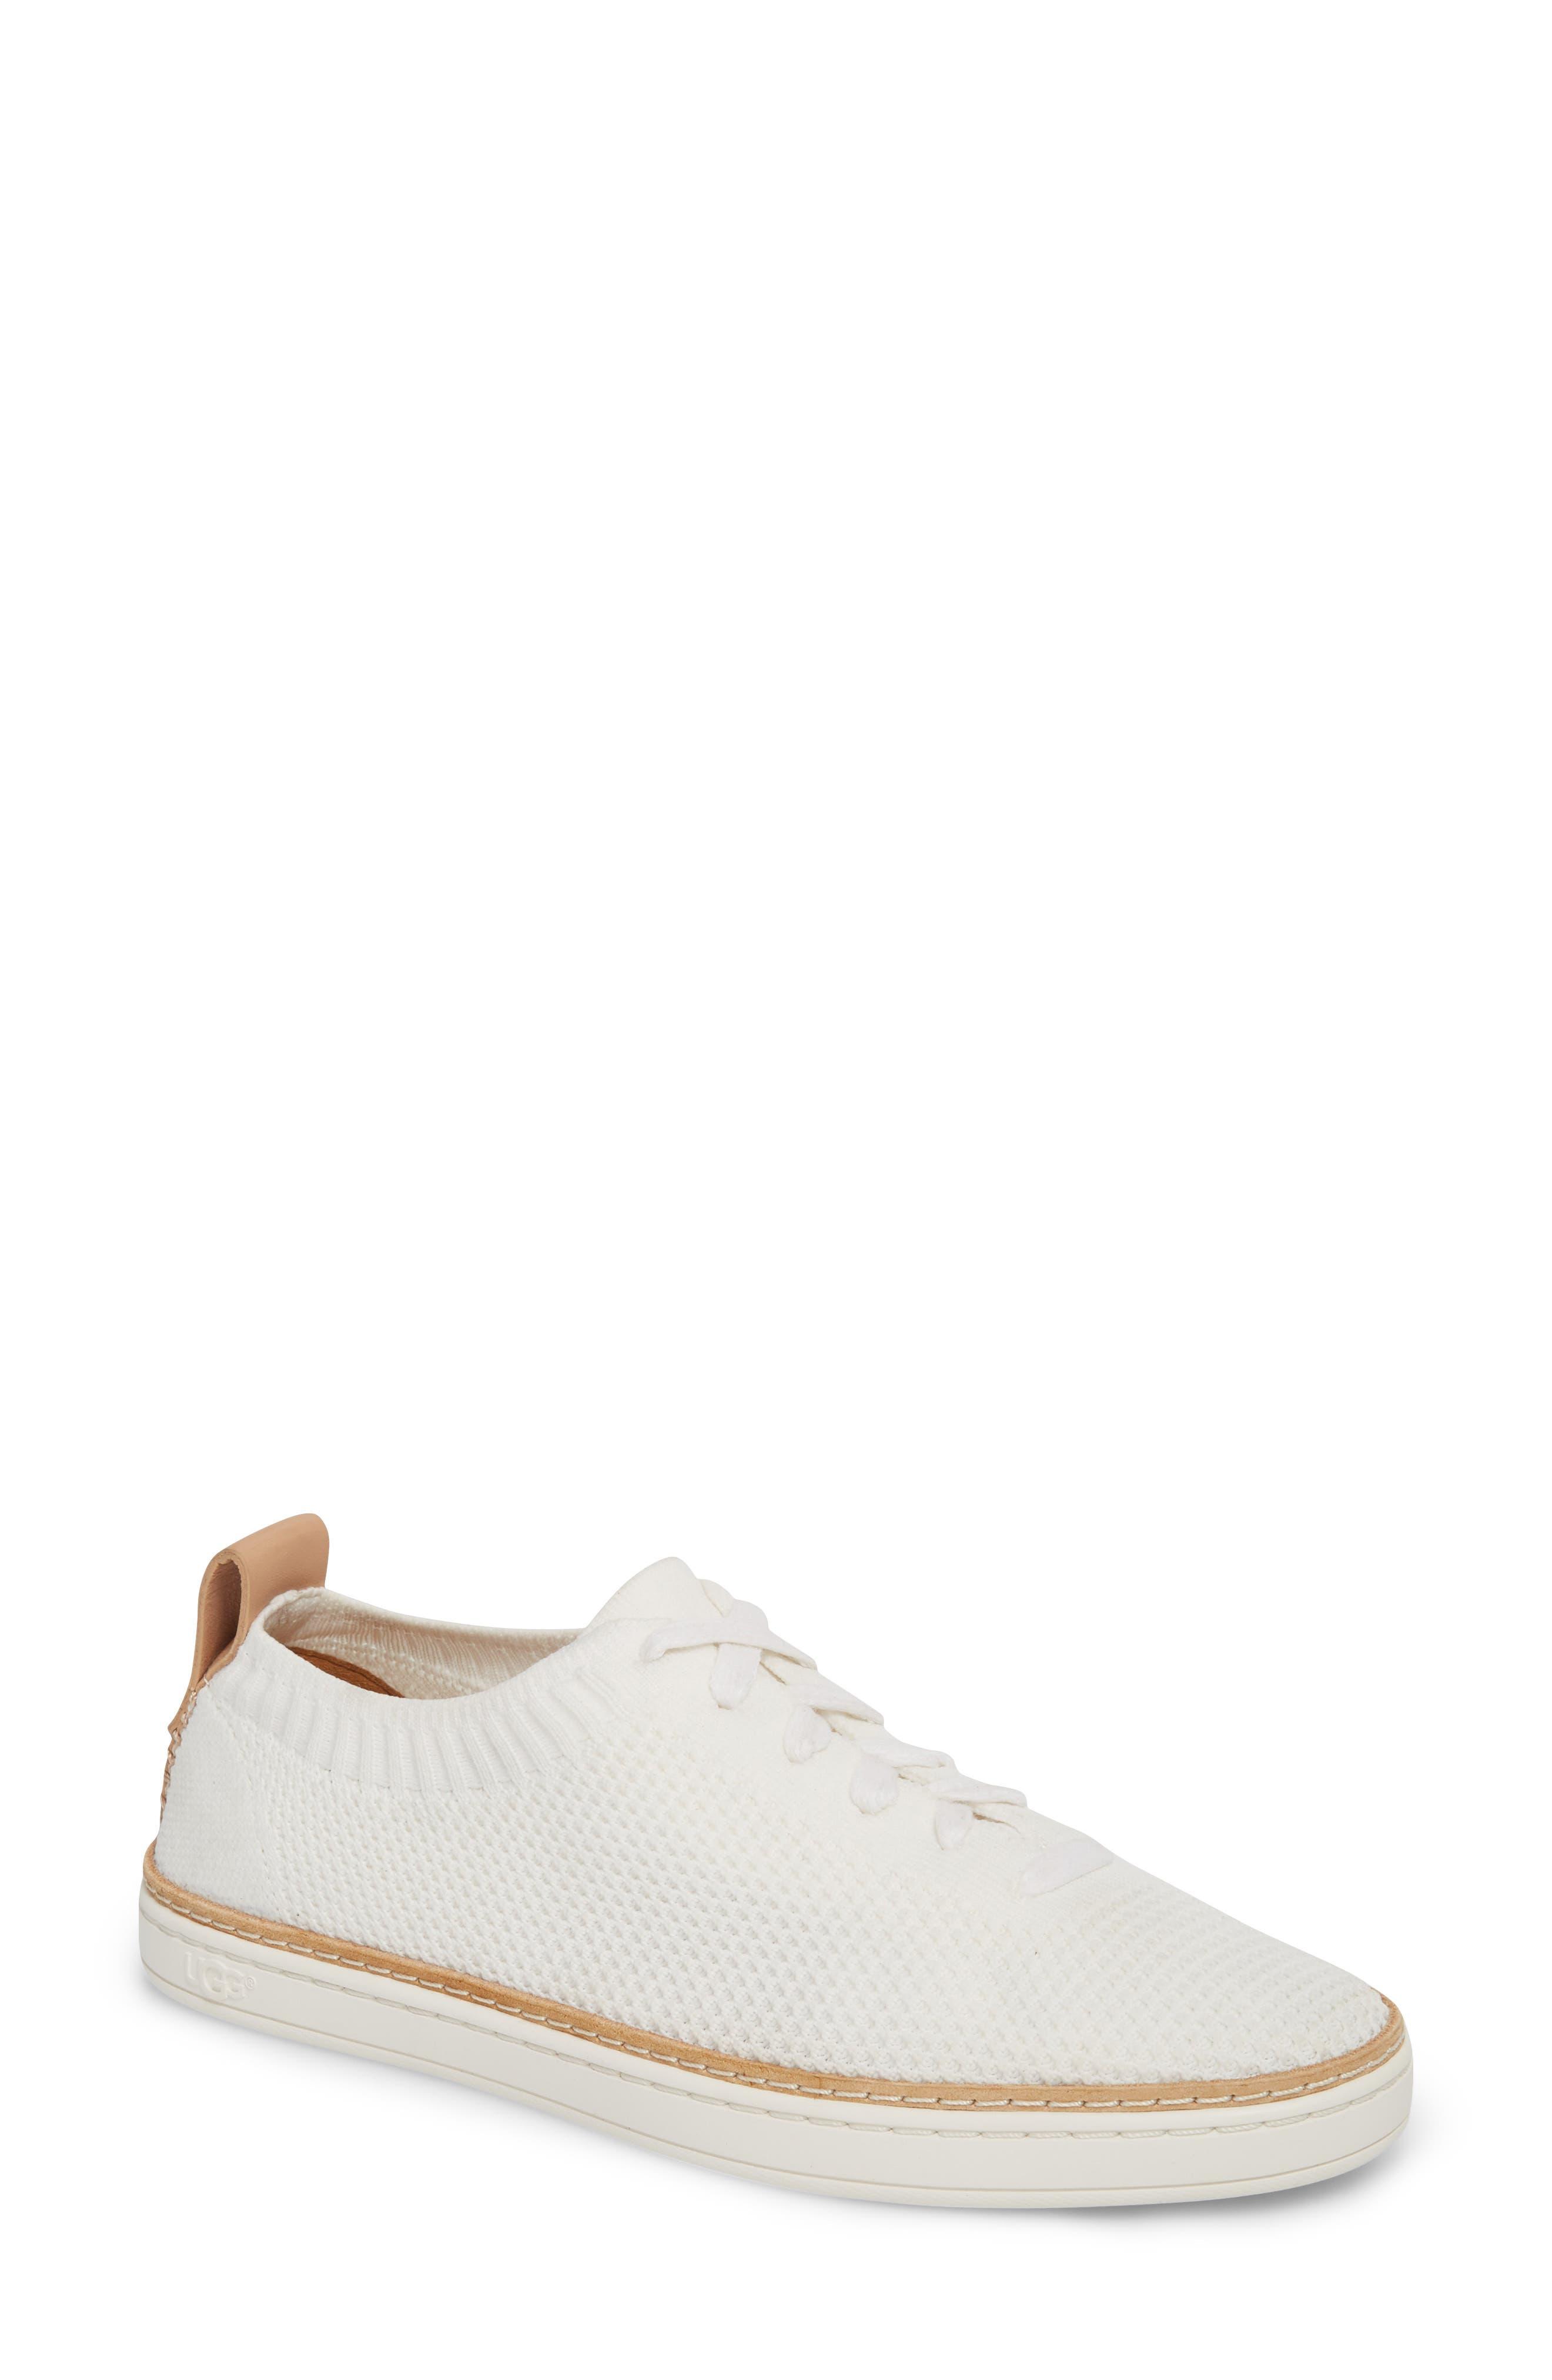 Sidney Sneaker, Main, color, 100